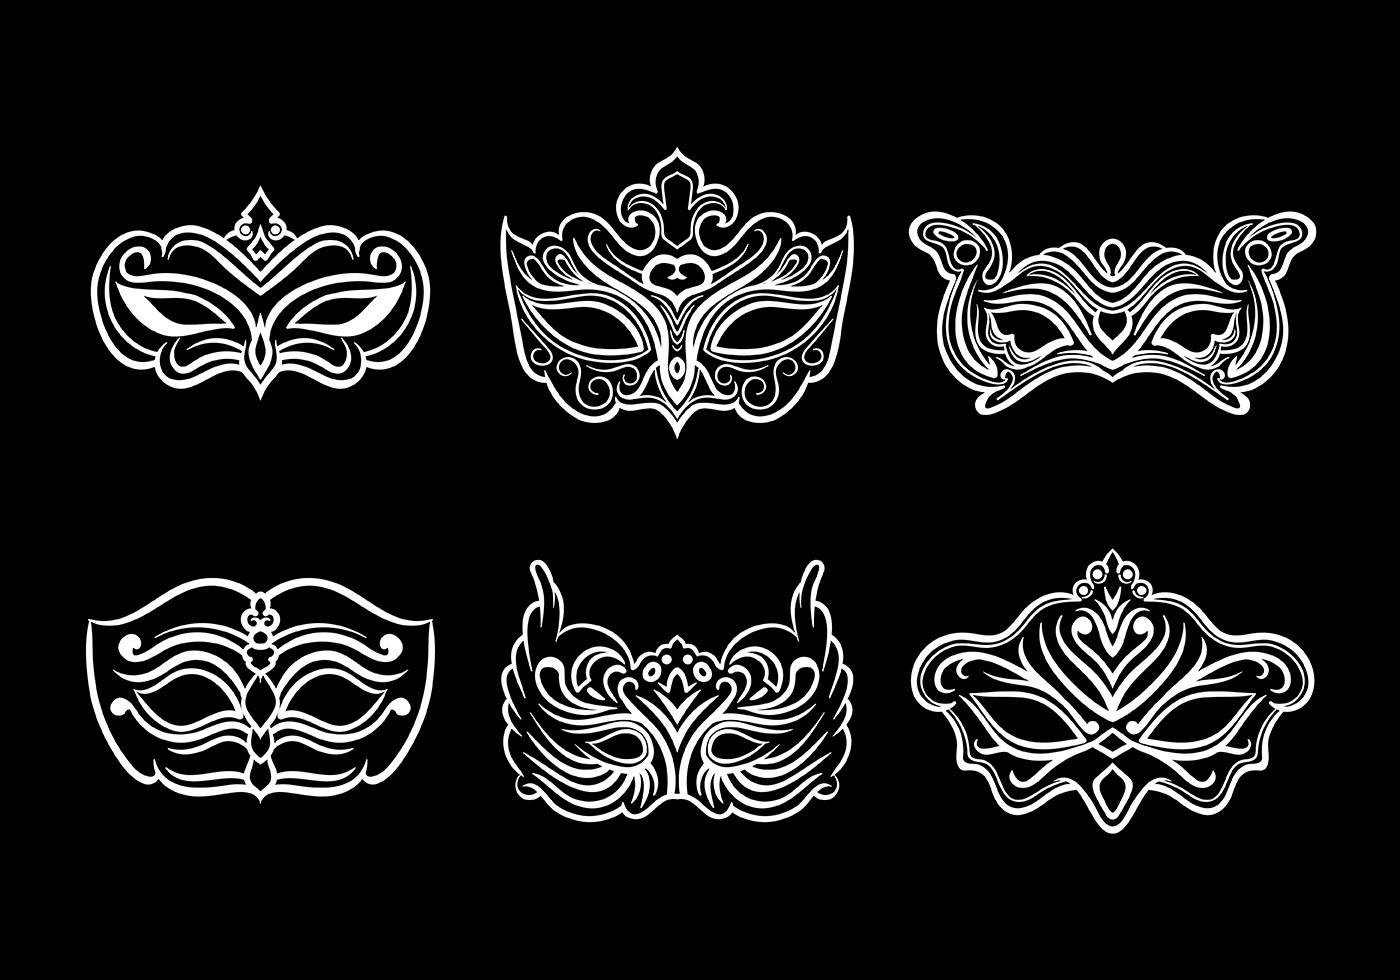 Masquerade Mask Icons Vector - Download Free Vectors ...  Masquerade Mask Vector